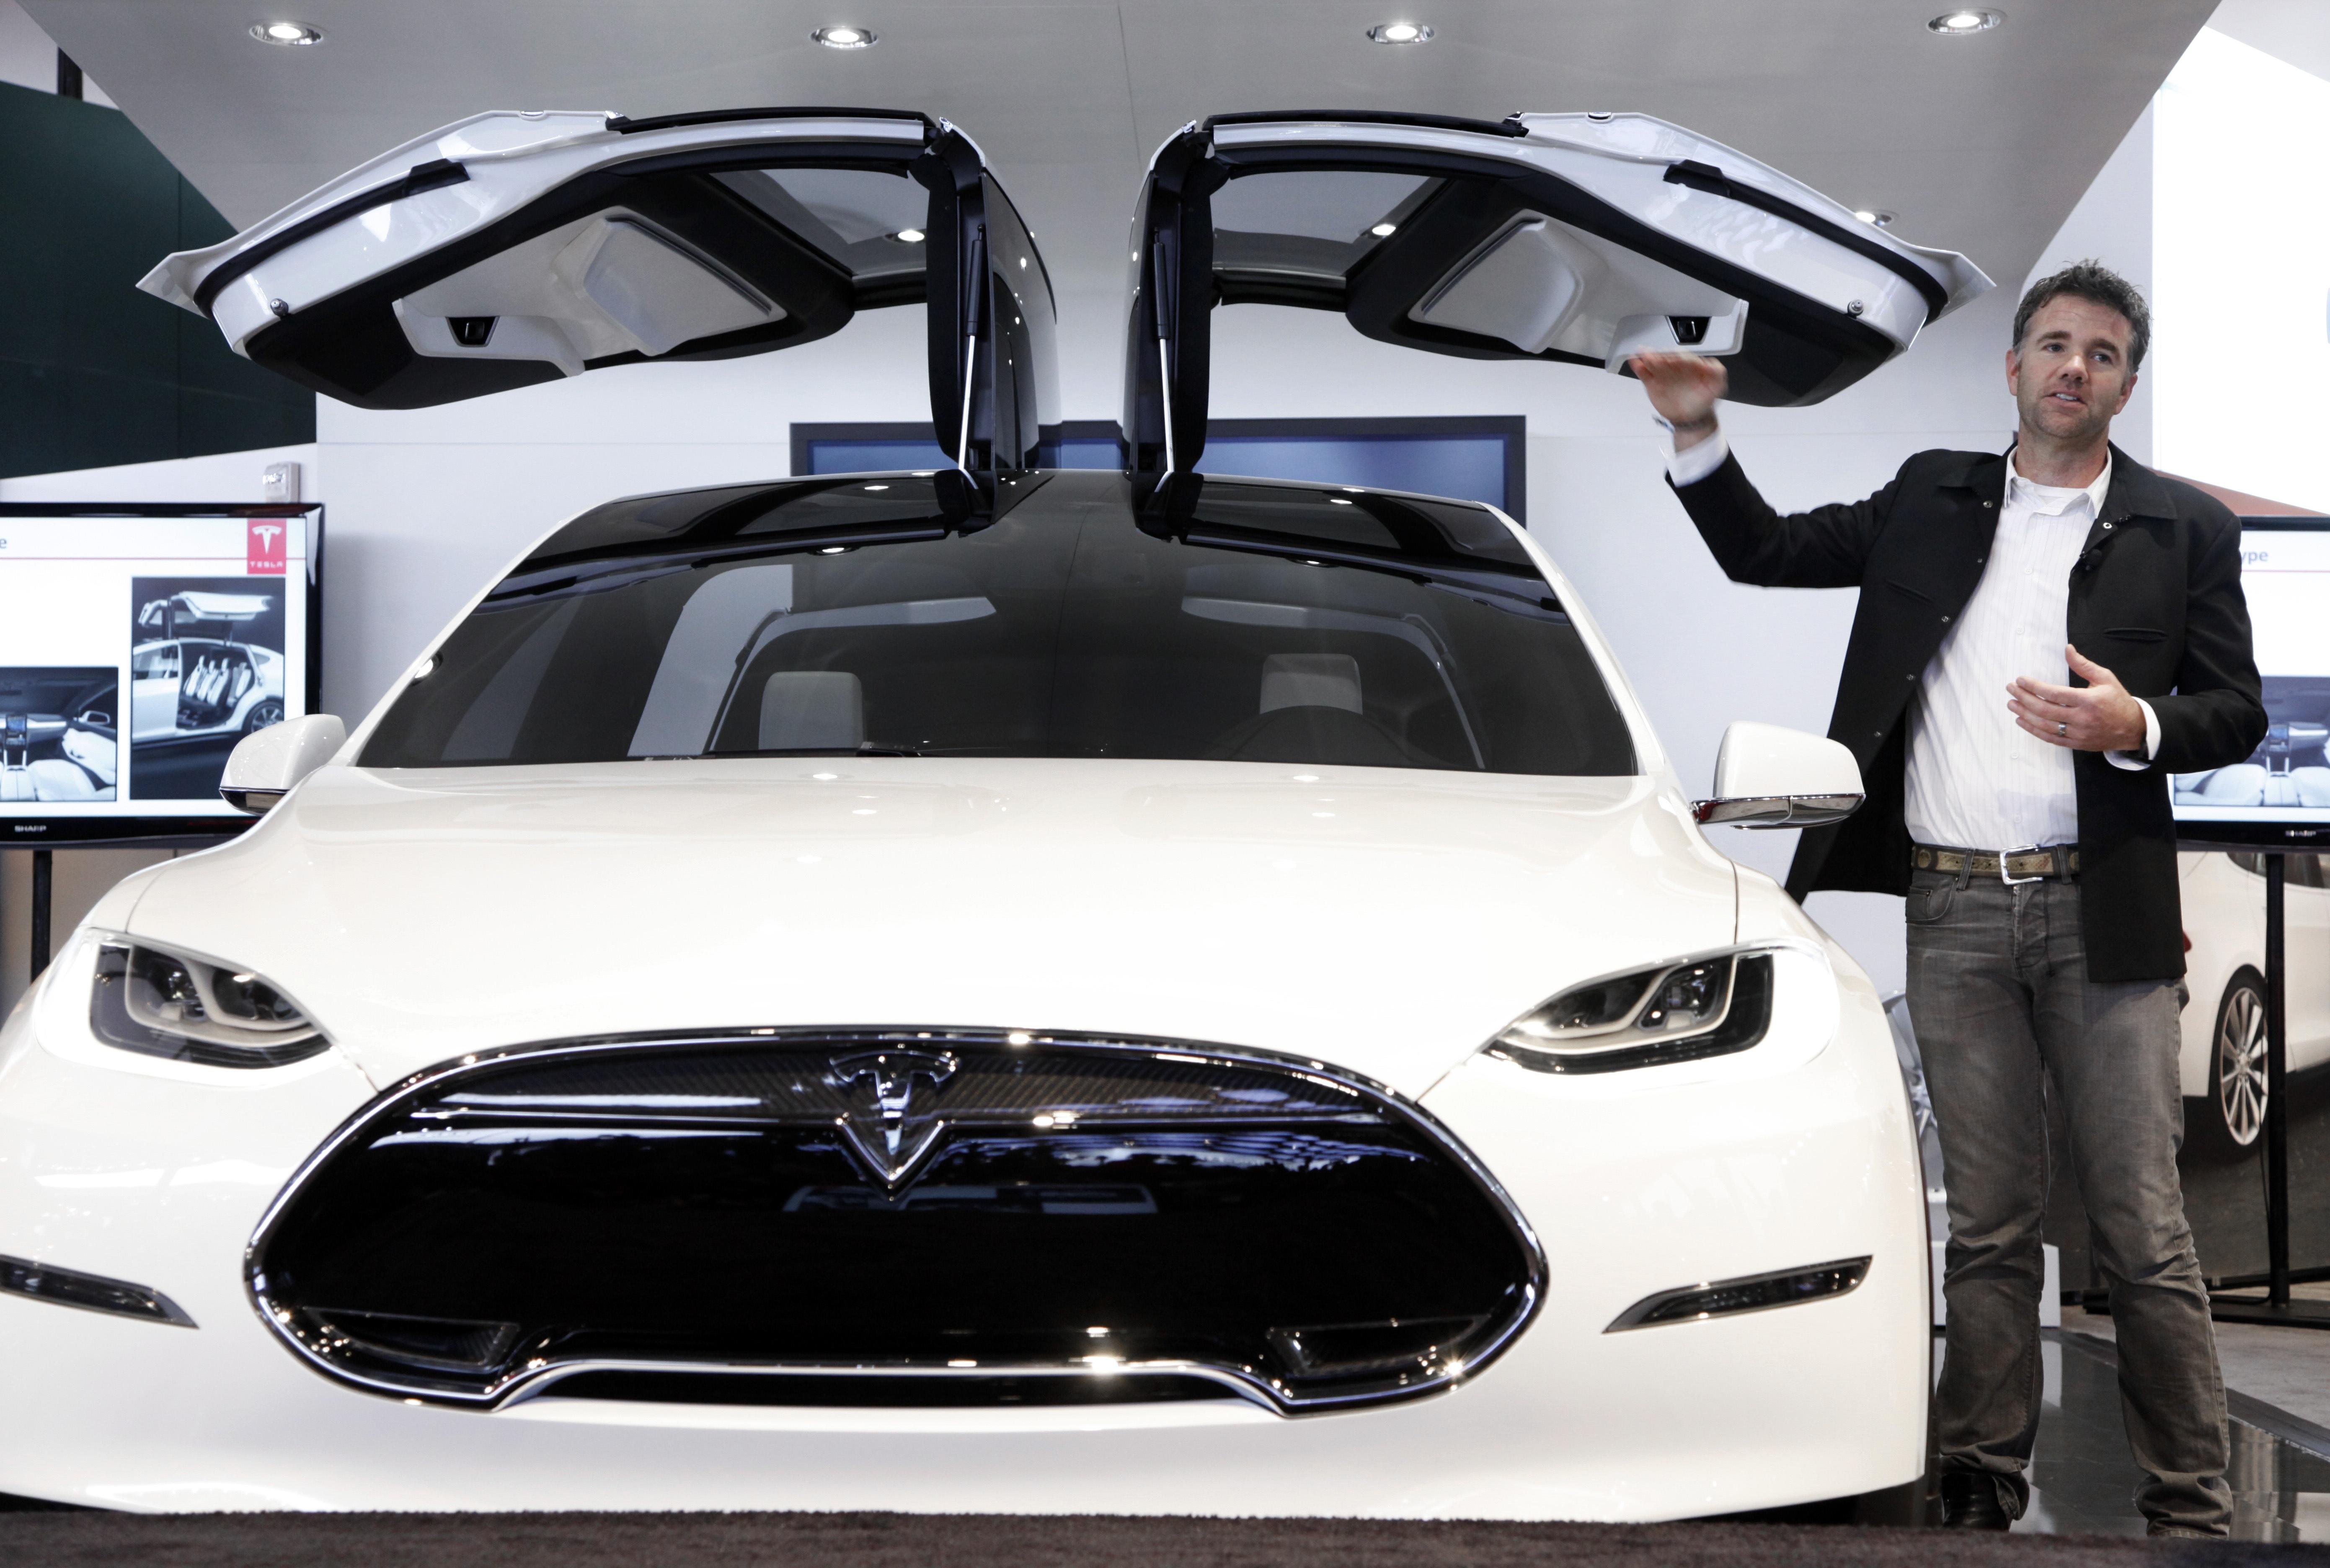 Franz von Holzhausen, Chief Designer, Tesla Motors talks about the doors on the Tesla Model X at the North American International Auto Show in Detroit, Jan. 15, 2013.